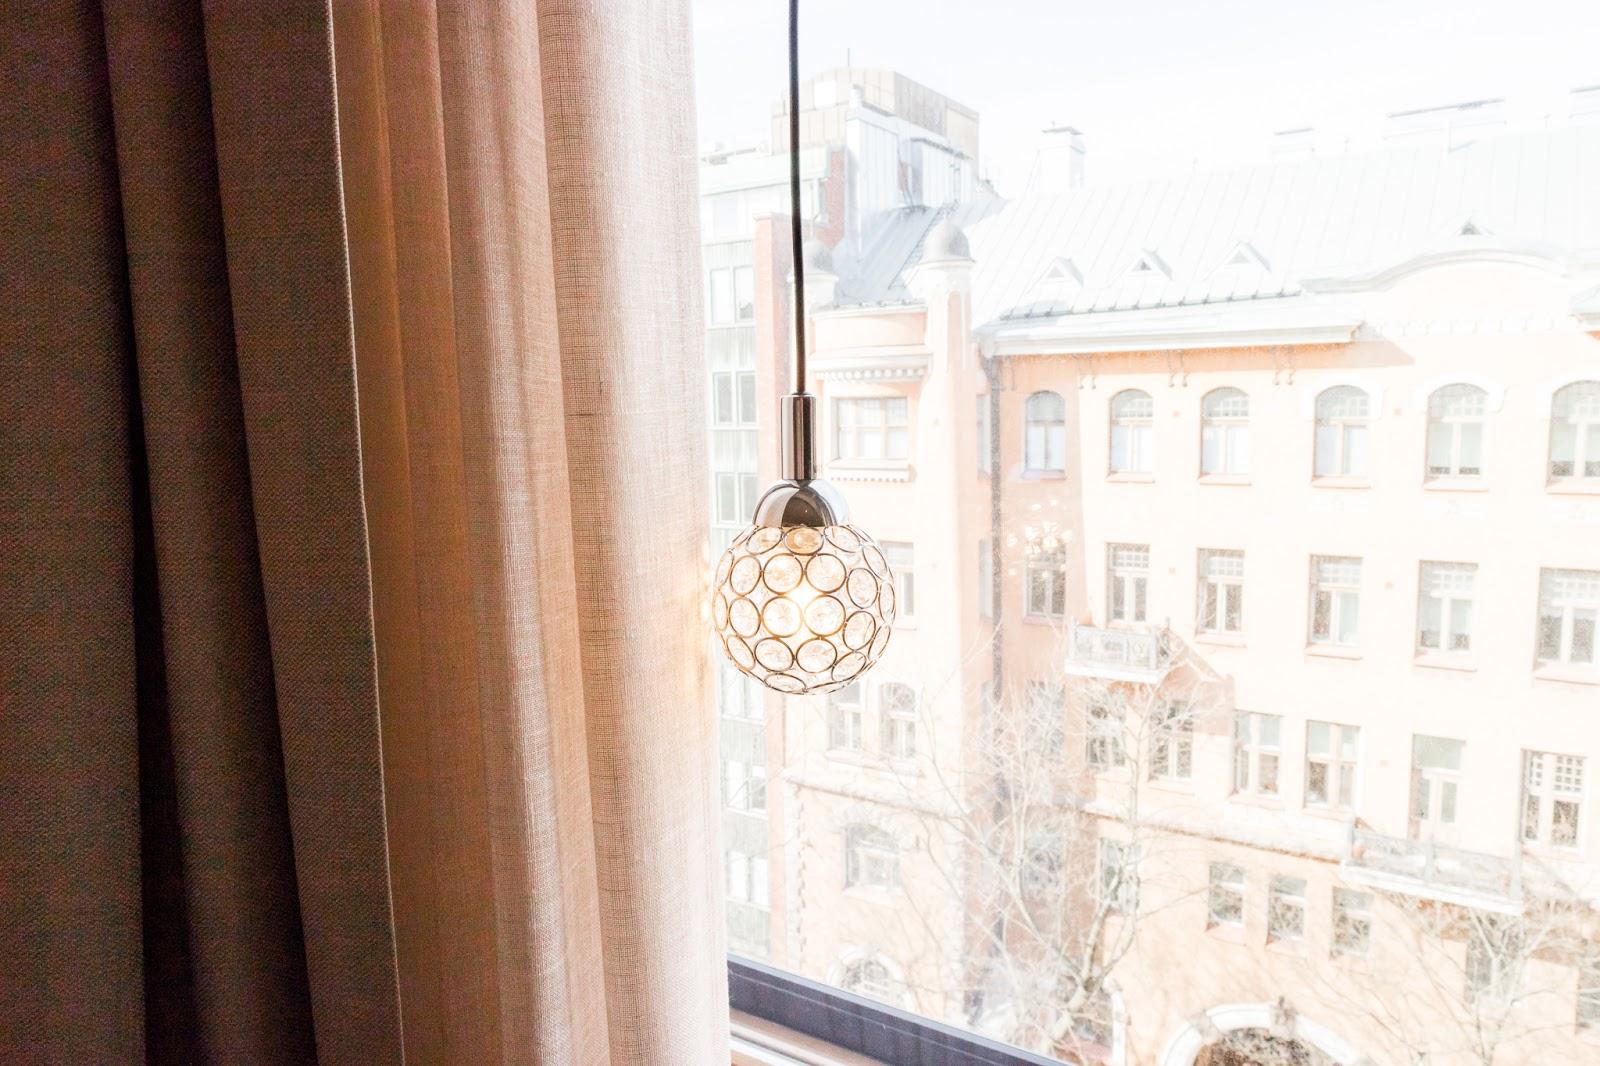 Lapland Hotels, Bulevardi, Helsinki, Otavamedia